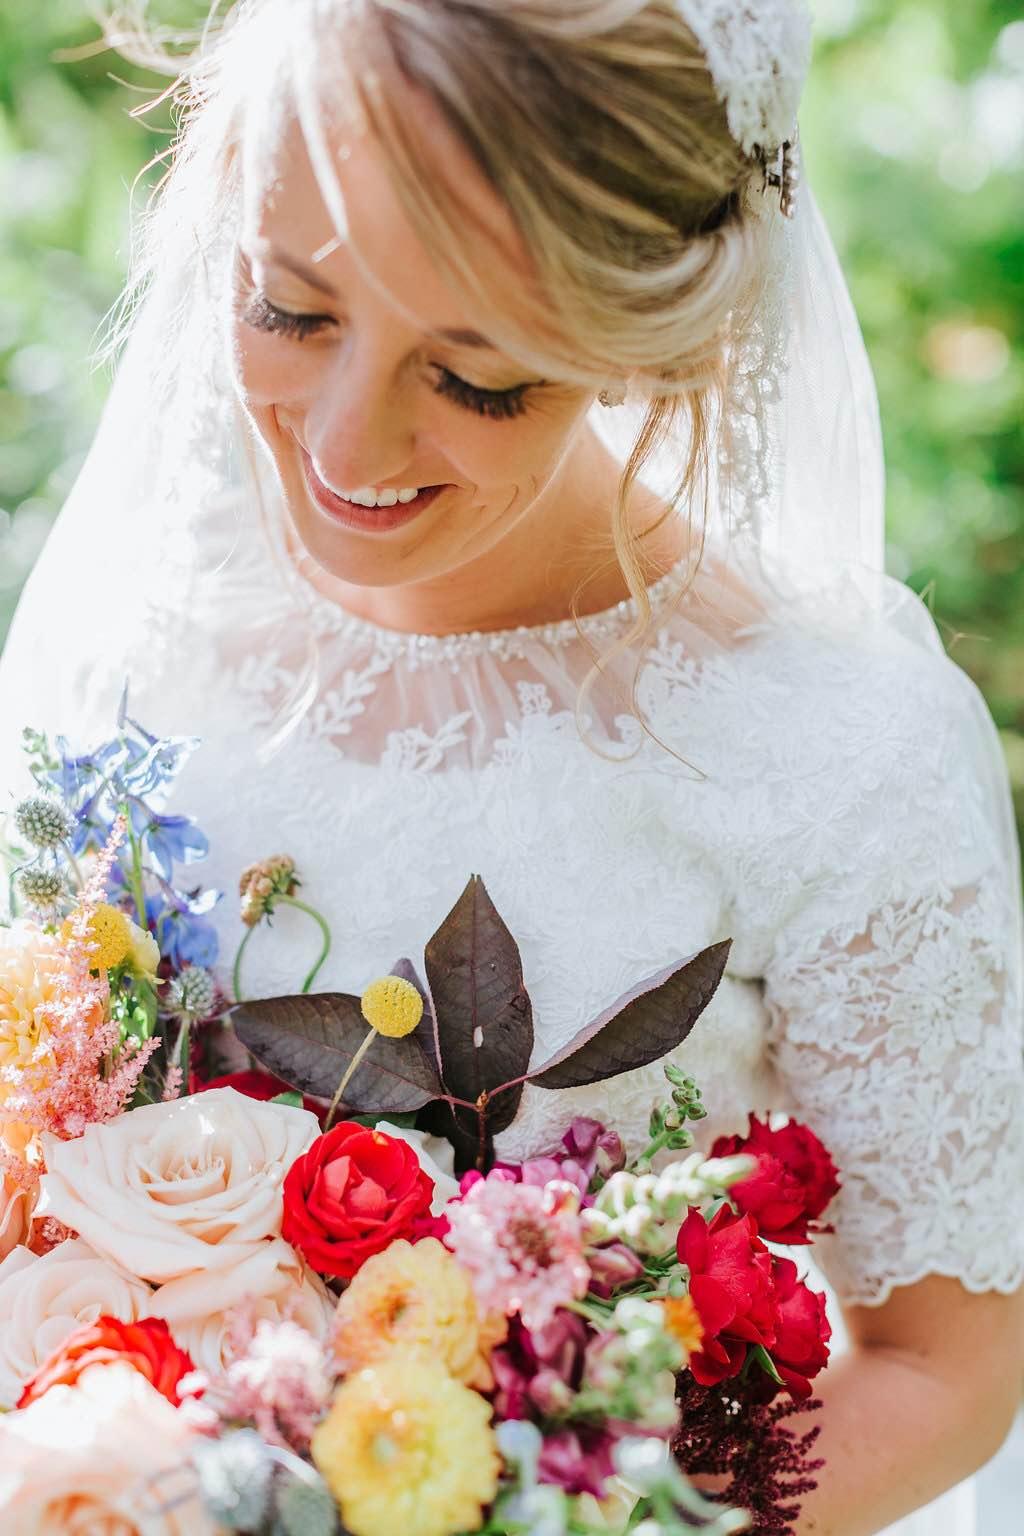 Brides In General 18